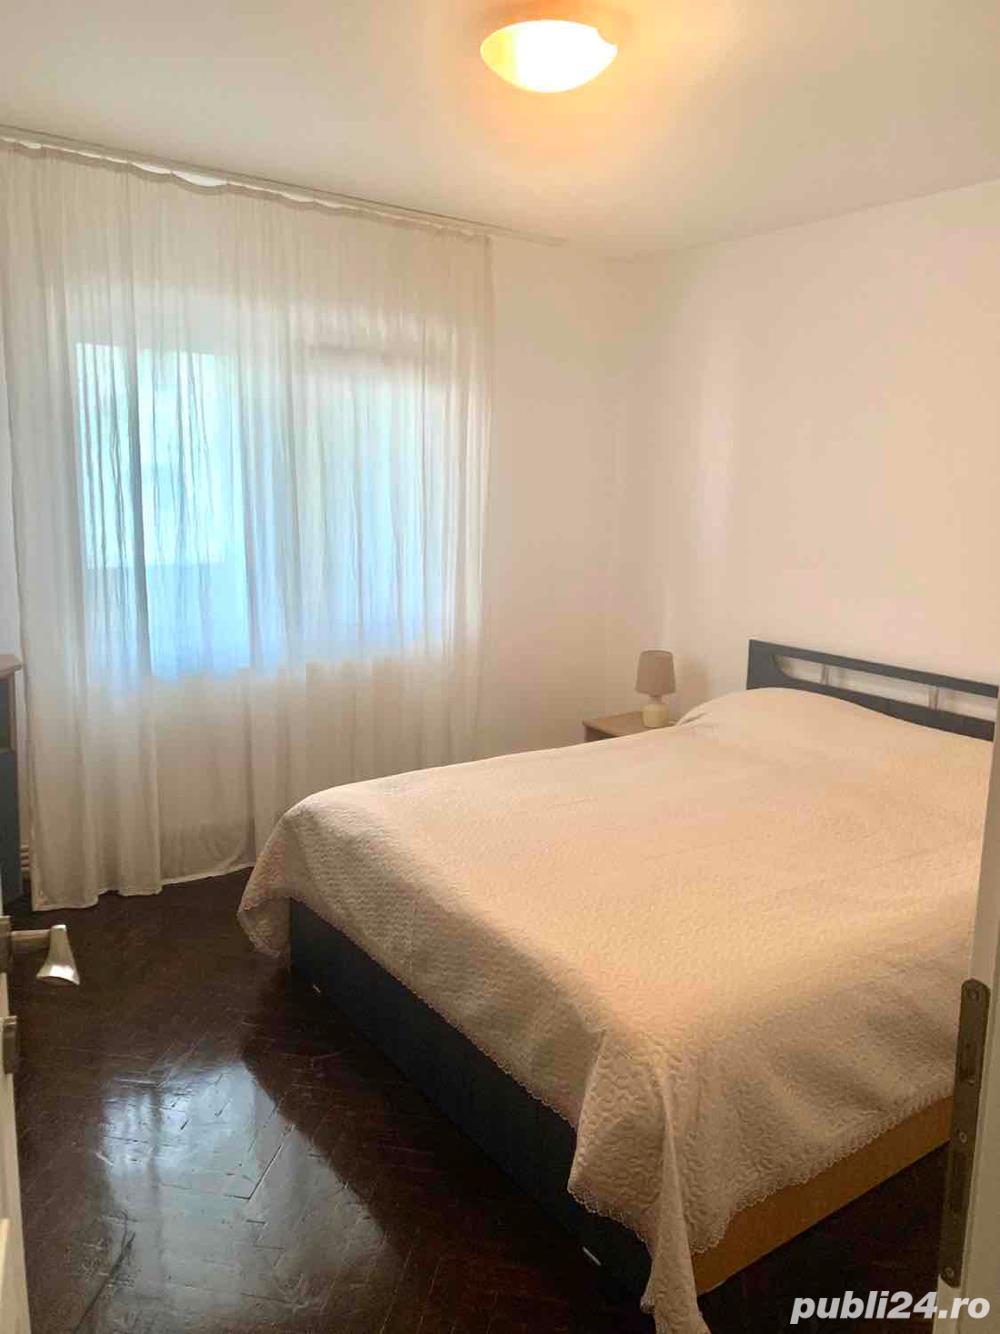 Regim hotelier 2 camere NON-STOP LUX 70 lei/3 ore